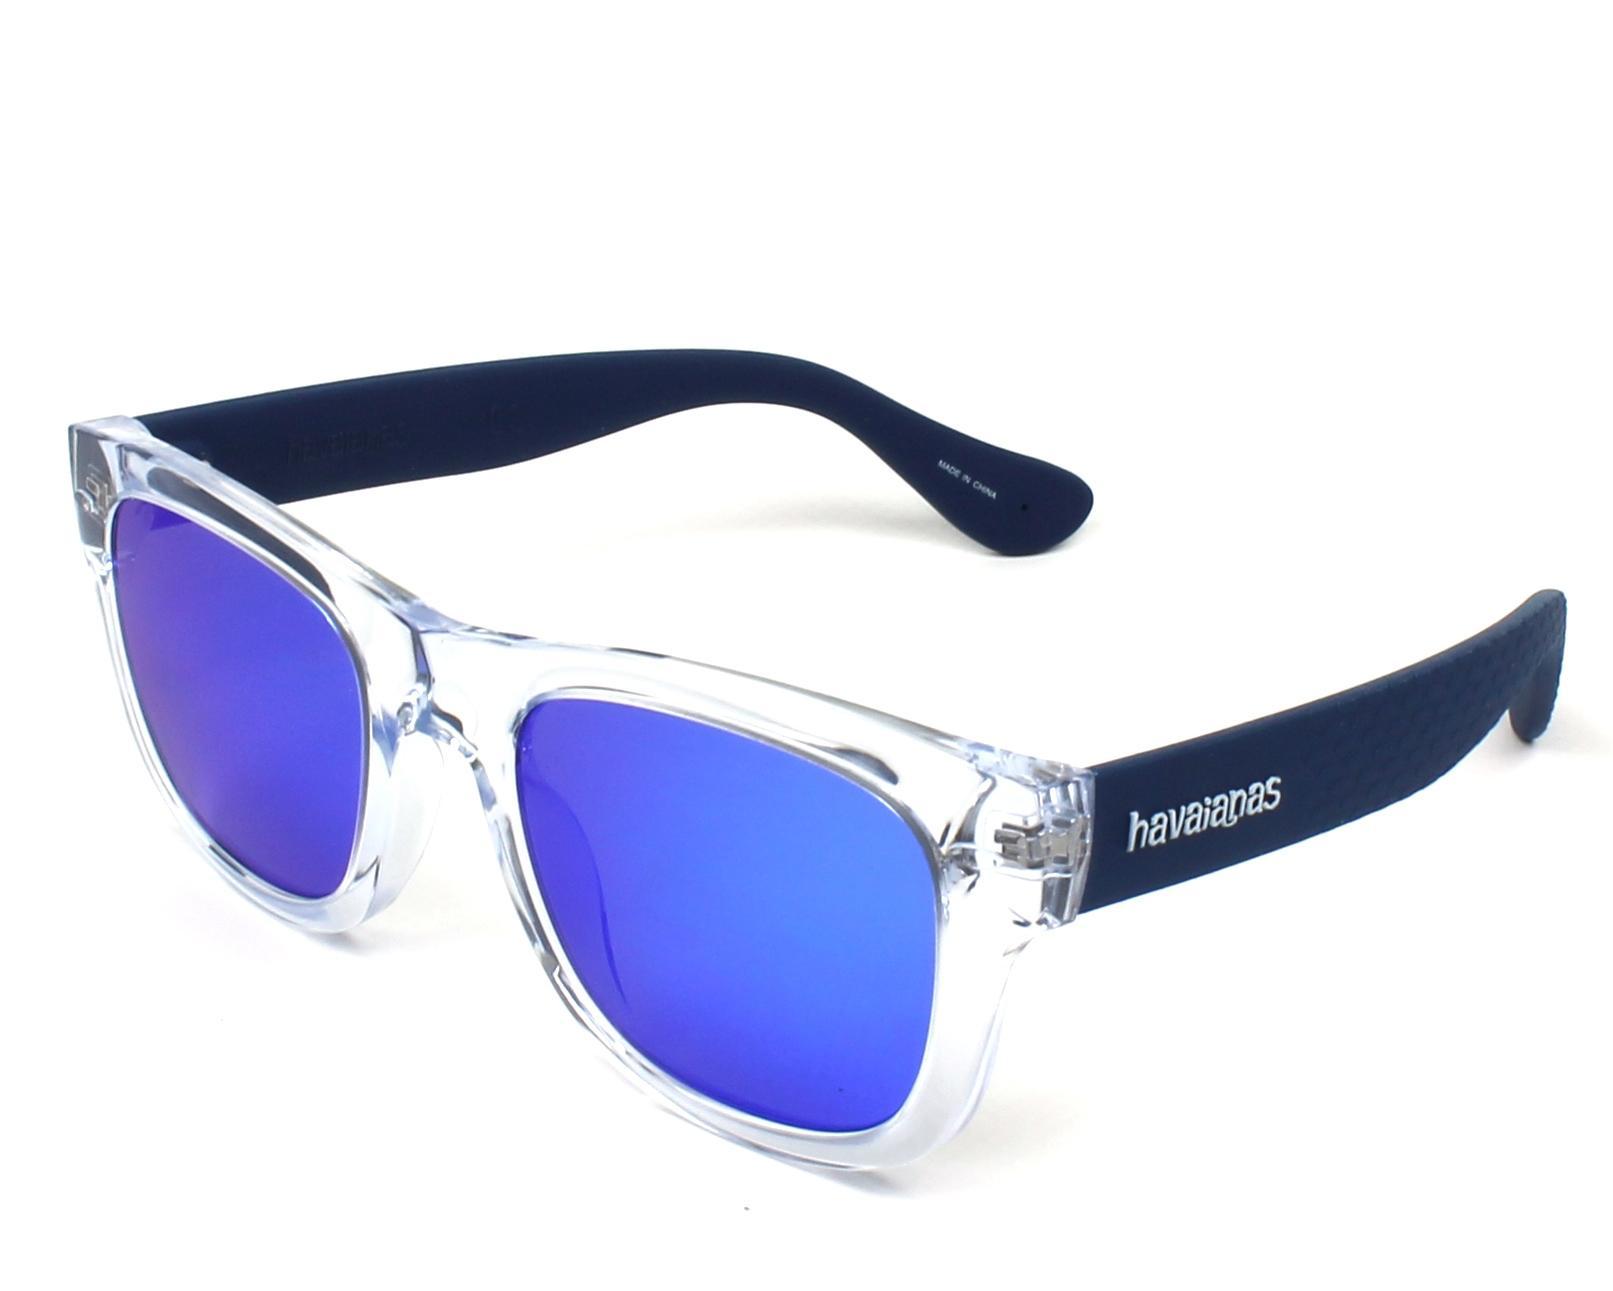 296ac05c9c3 Sunglasses Havaianas PARATY-M QM4 Z0 50-21 Crystal Blue profile view